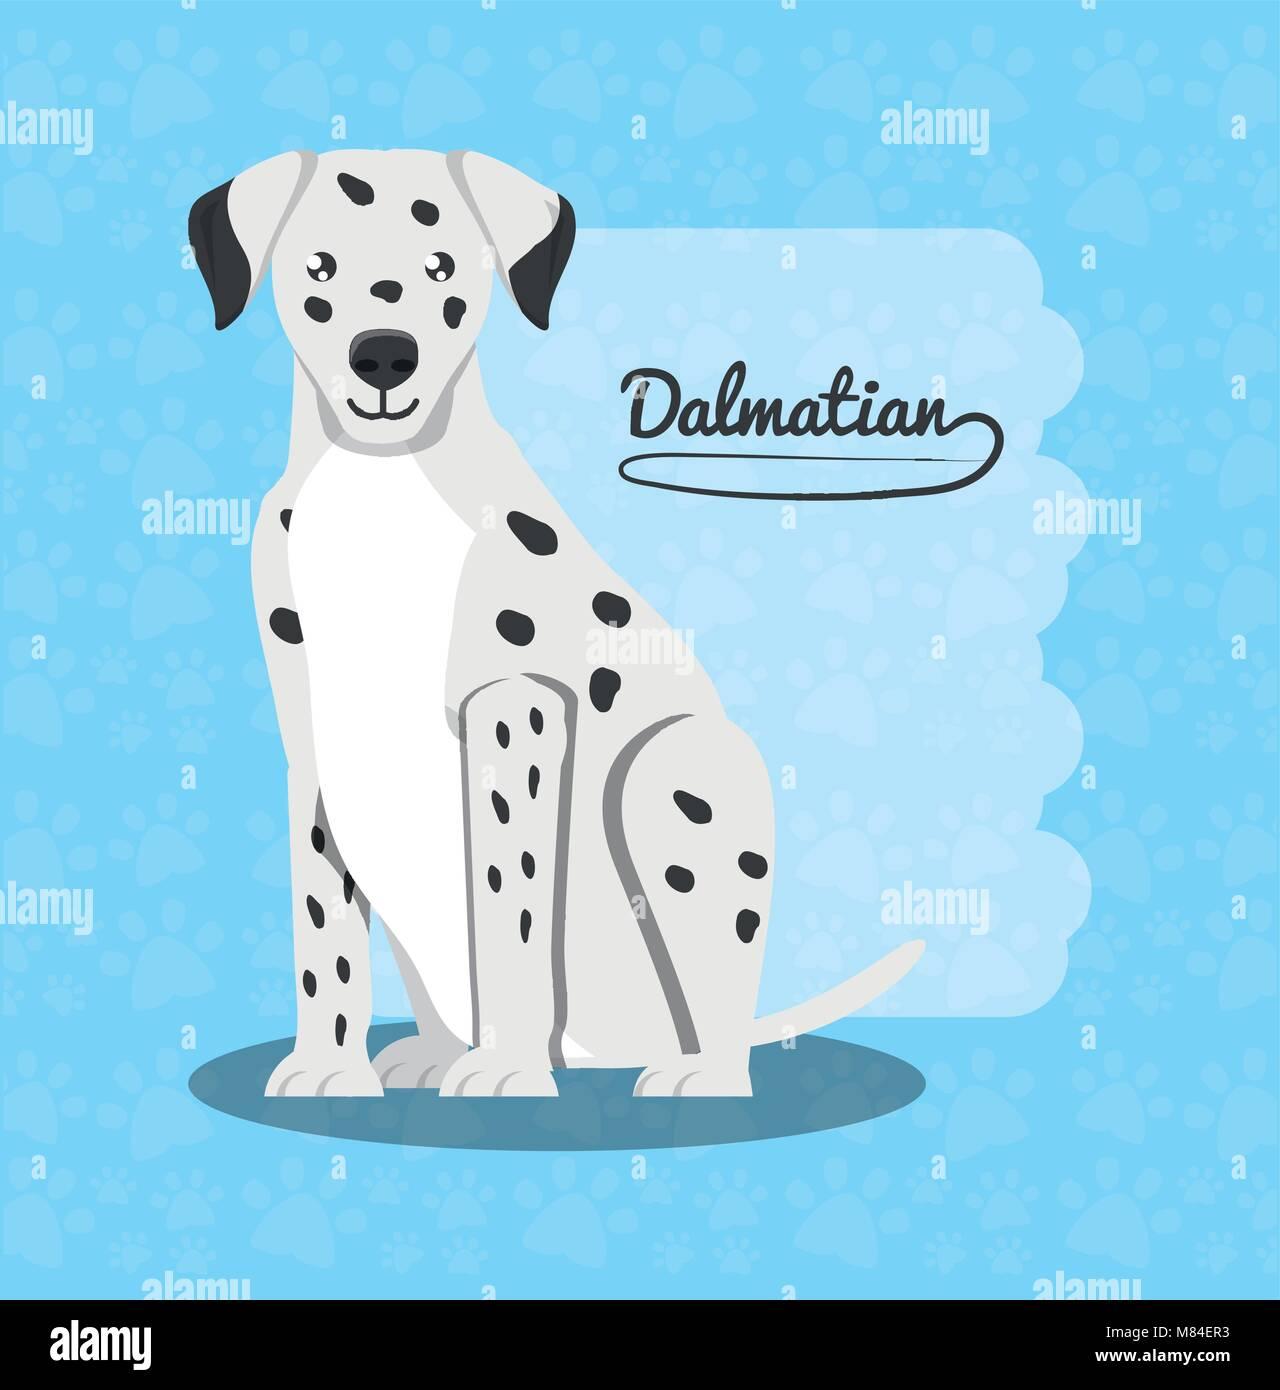 Dalmatian dog icon over blue background, colorful design vector illustration - Stock Vector